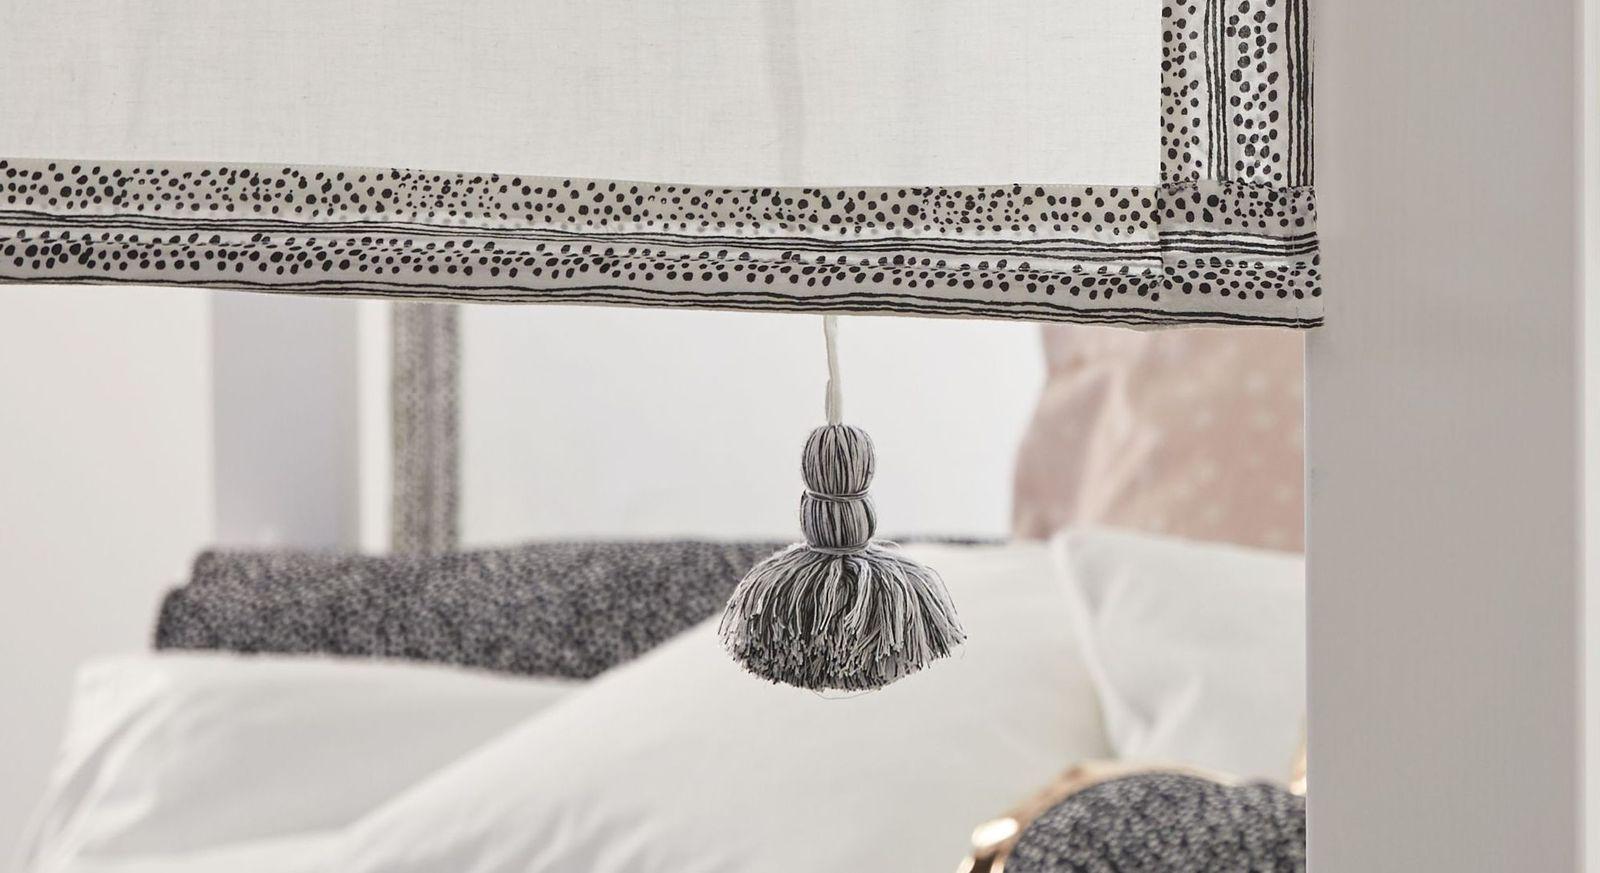 LIFETIME Himmelbett Living Style mit schwarzem Muster am Baldachin